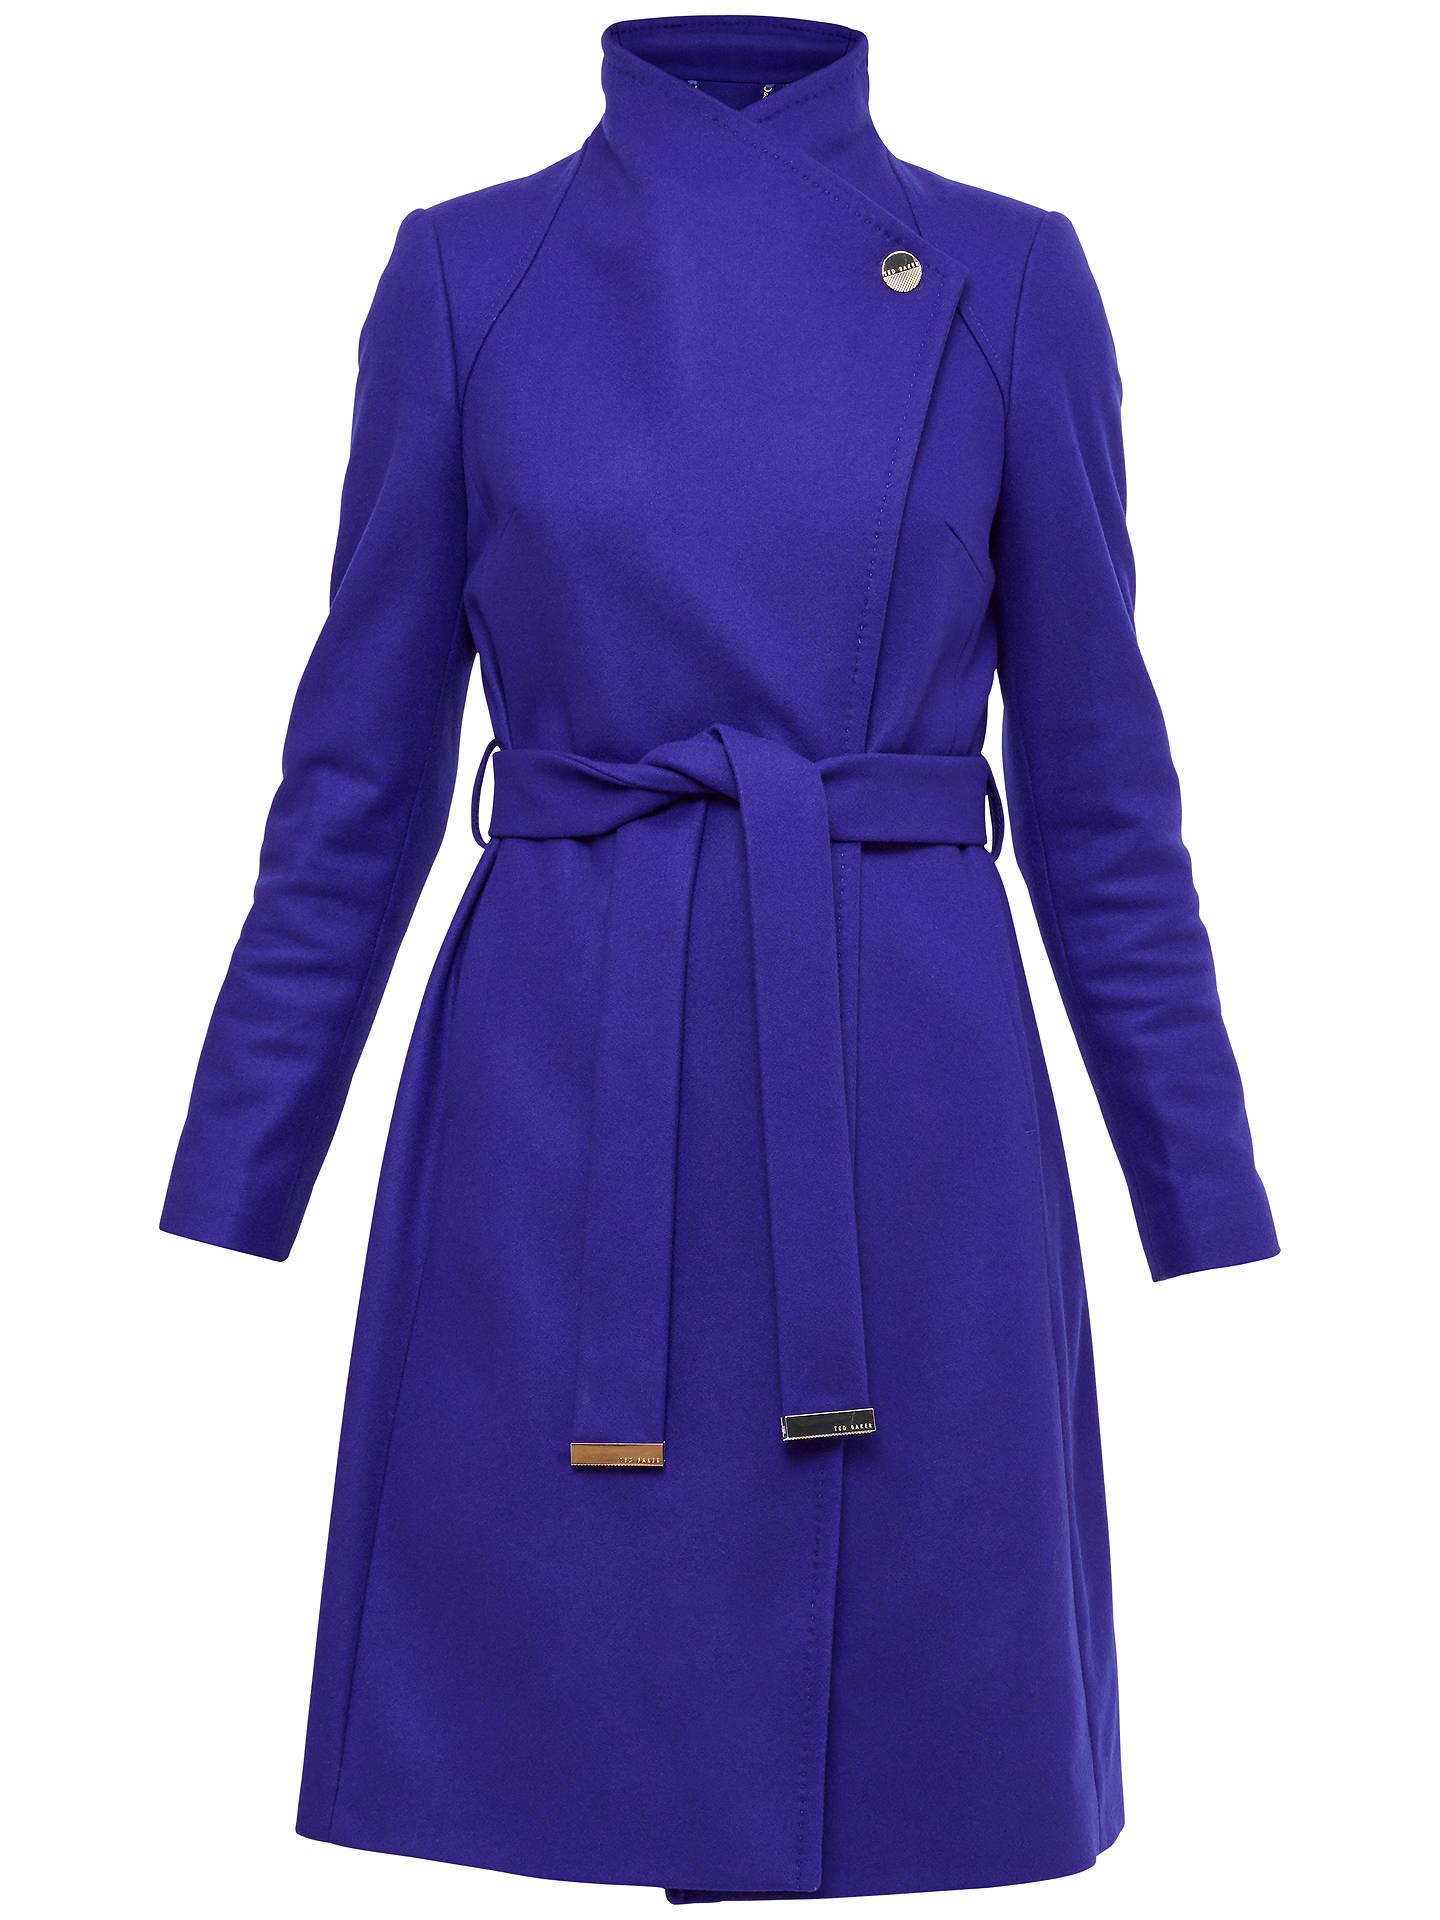 8a8ccbb94a5fef Buy Ted Baker Aurore Long Wrap Collar Coat